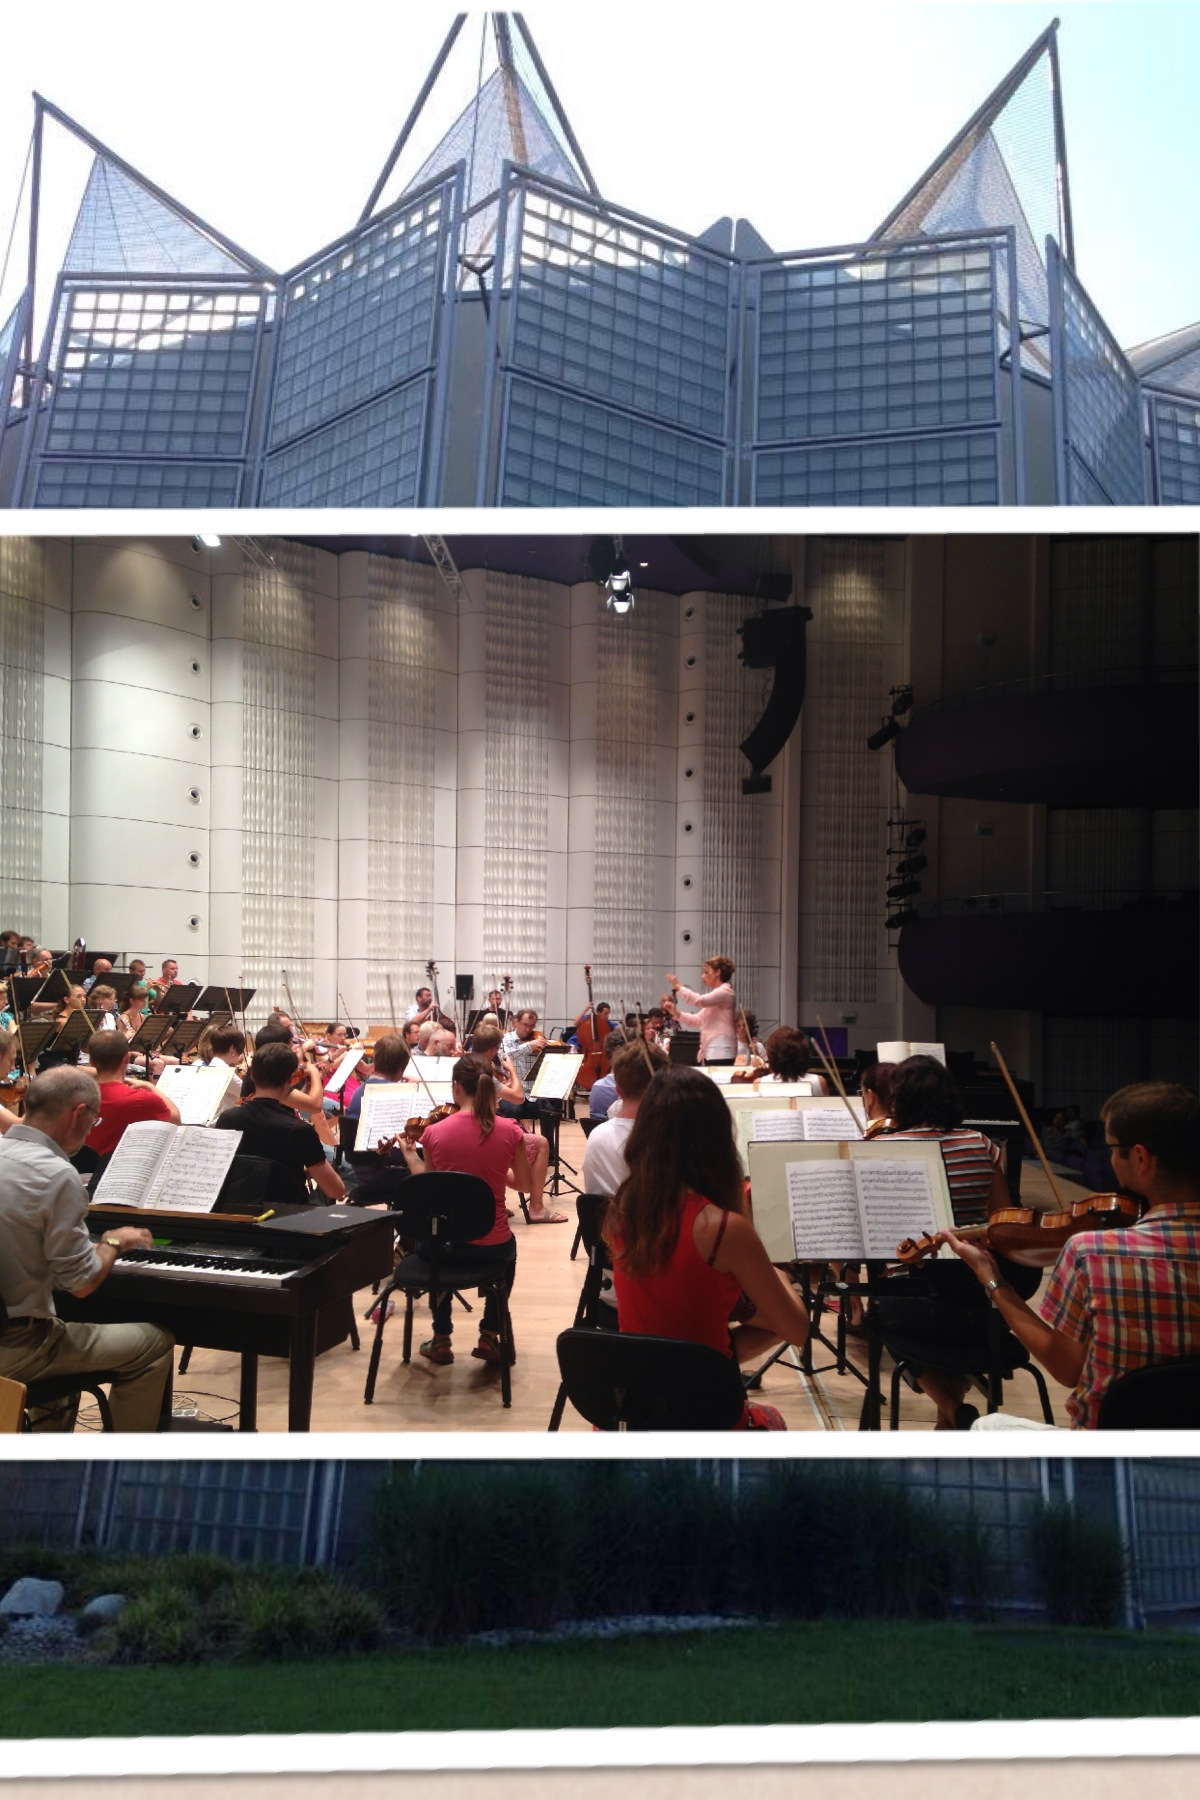 The Bohuslav Martinů Philharmonic Orchestra